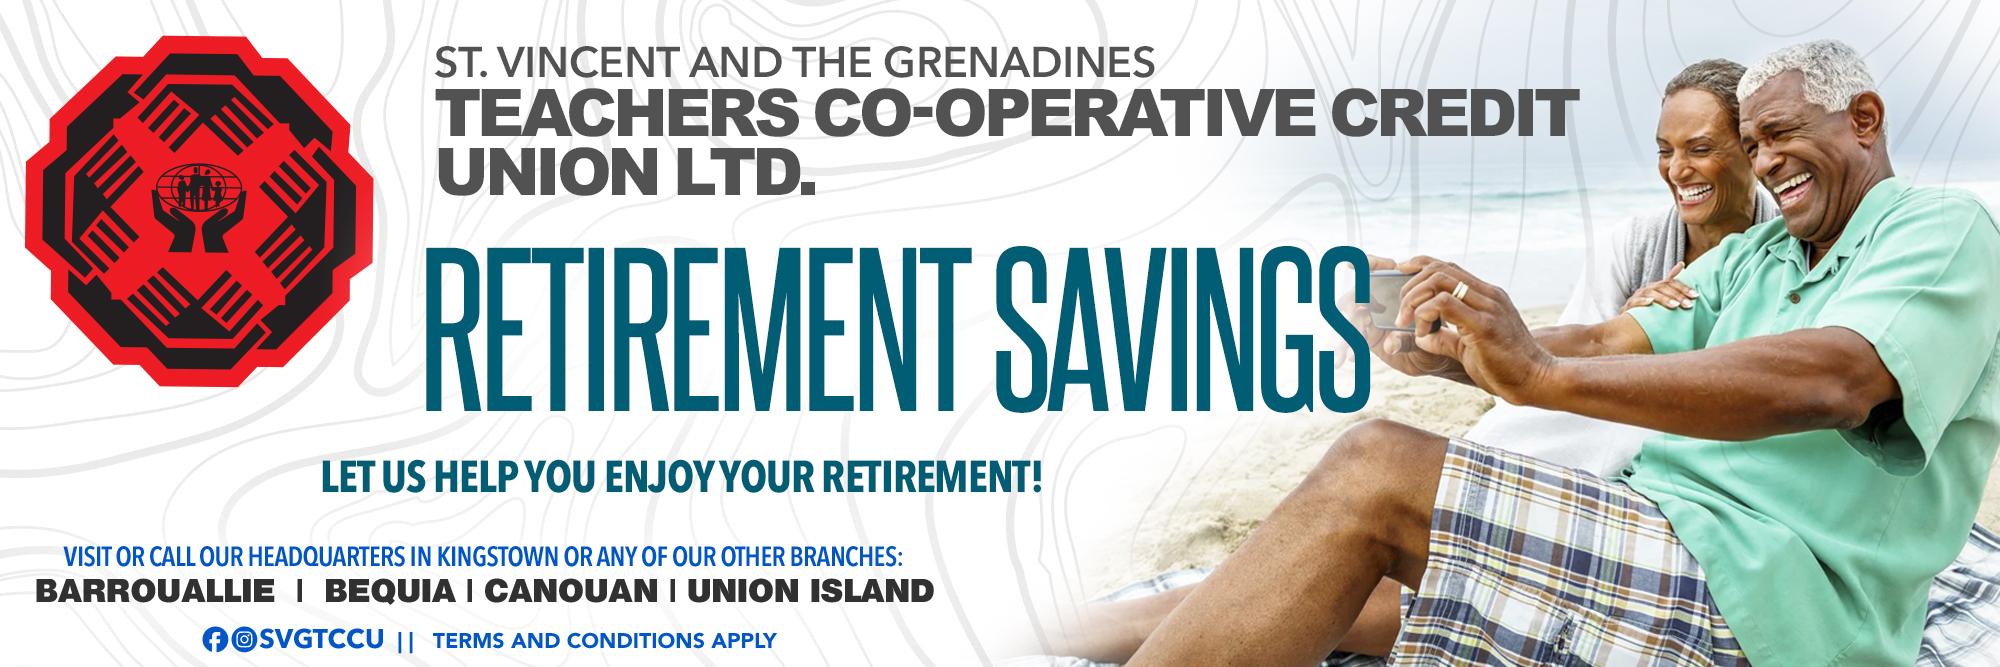 Retirement Savings, let us help you enjoy your retirement!